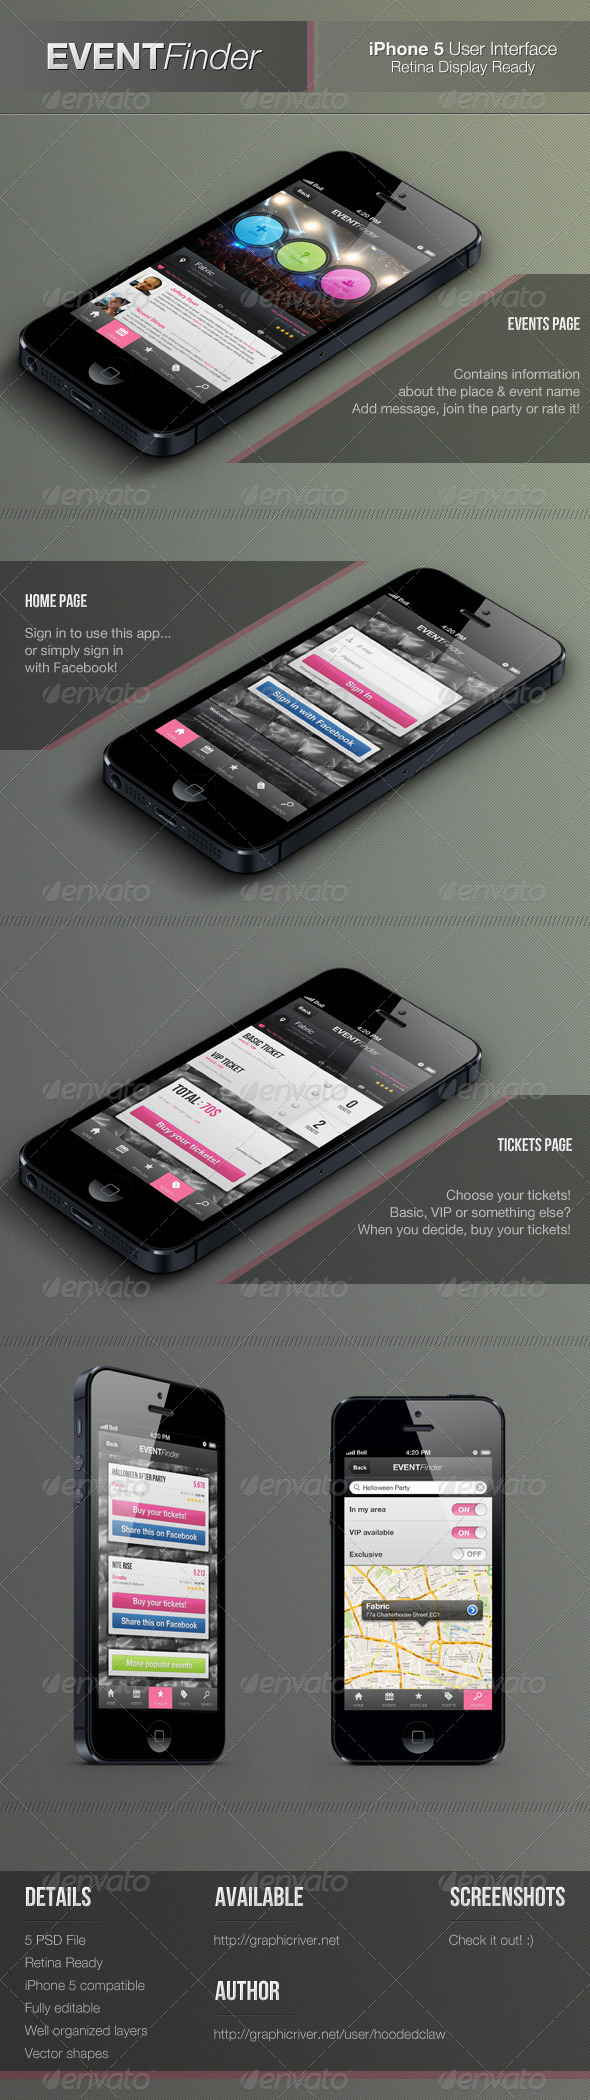 GraphicRiver Event Finder Retina Mobile Interface 3353274